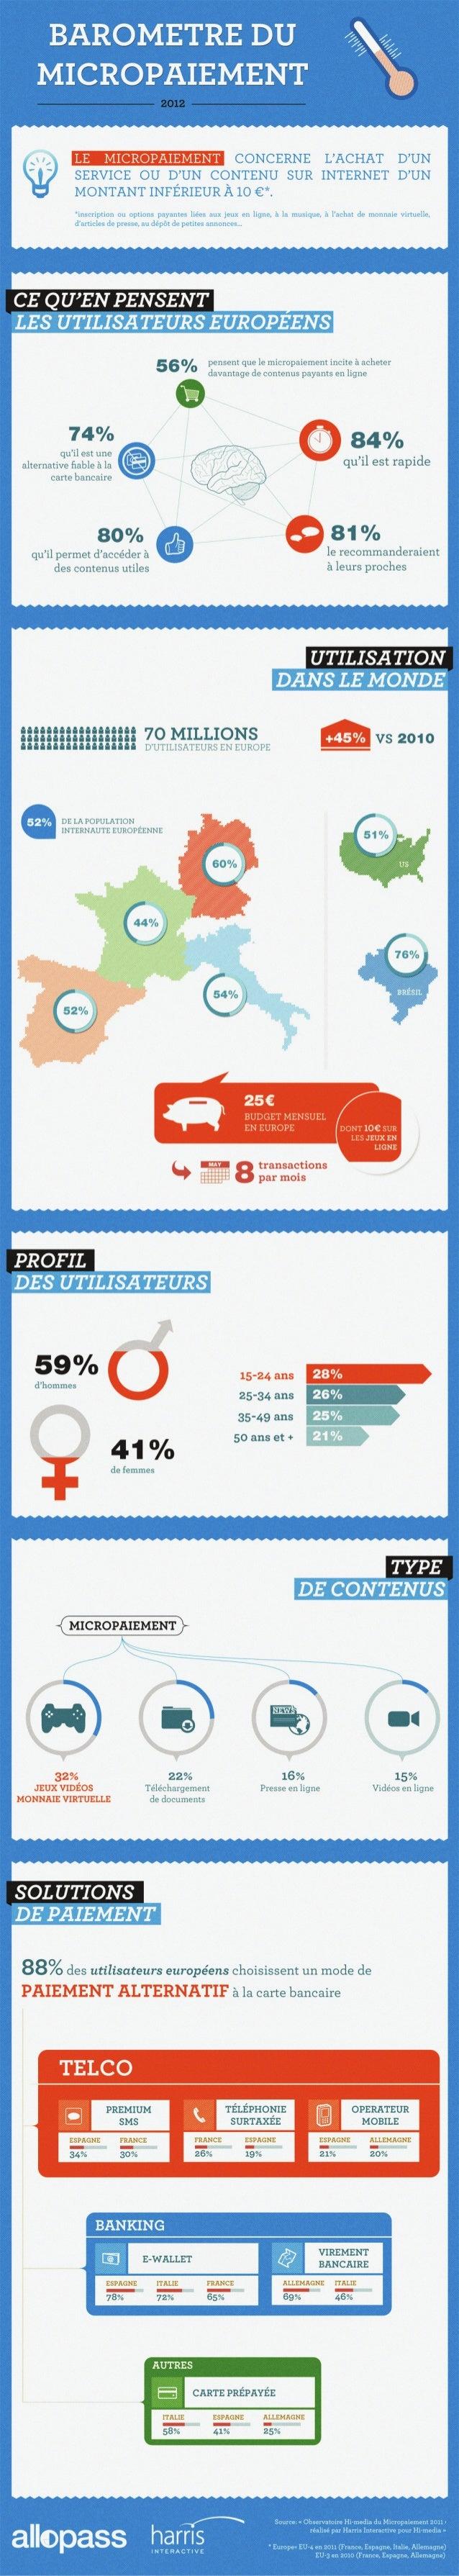 HiMedia infographie barometre du micropaiement 2012